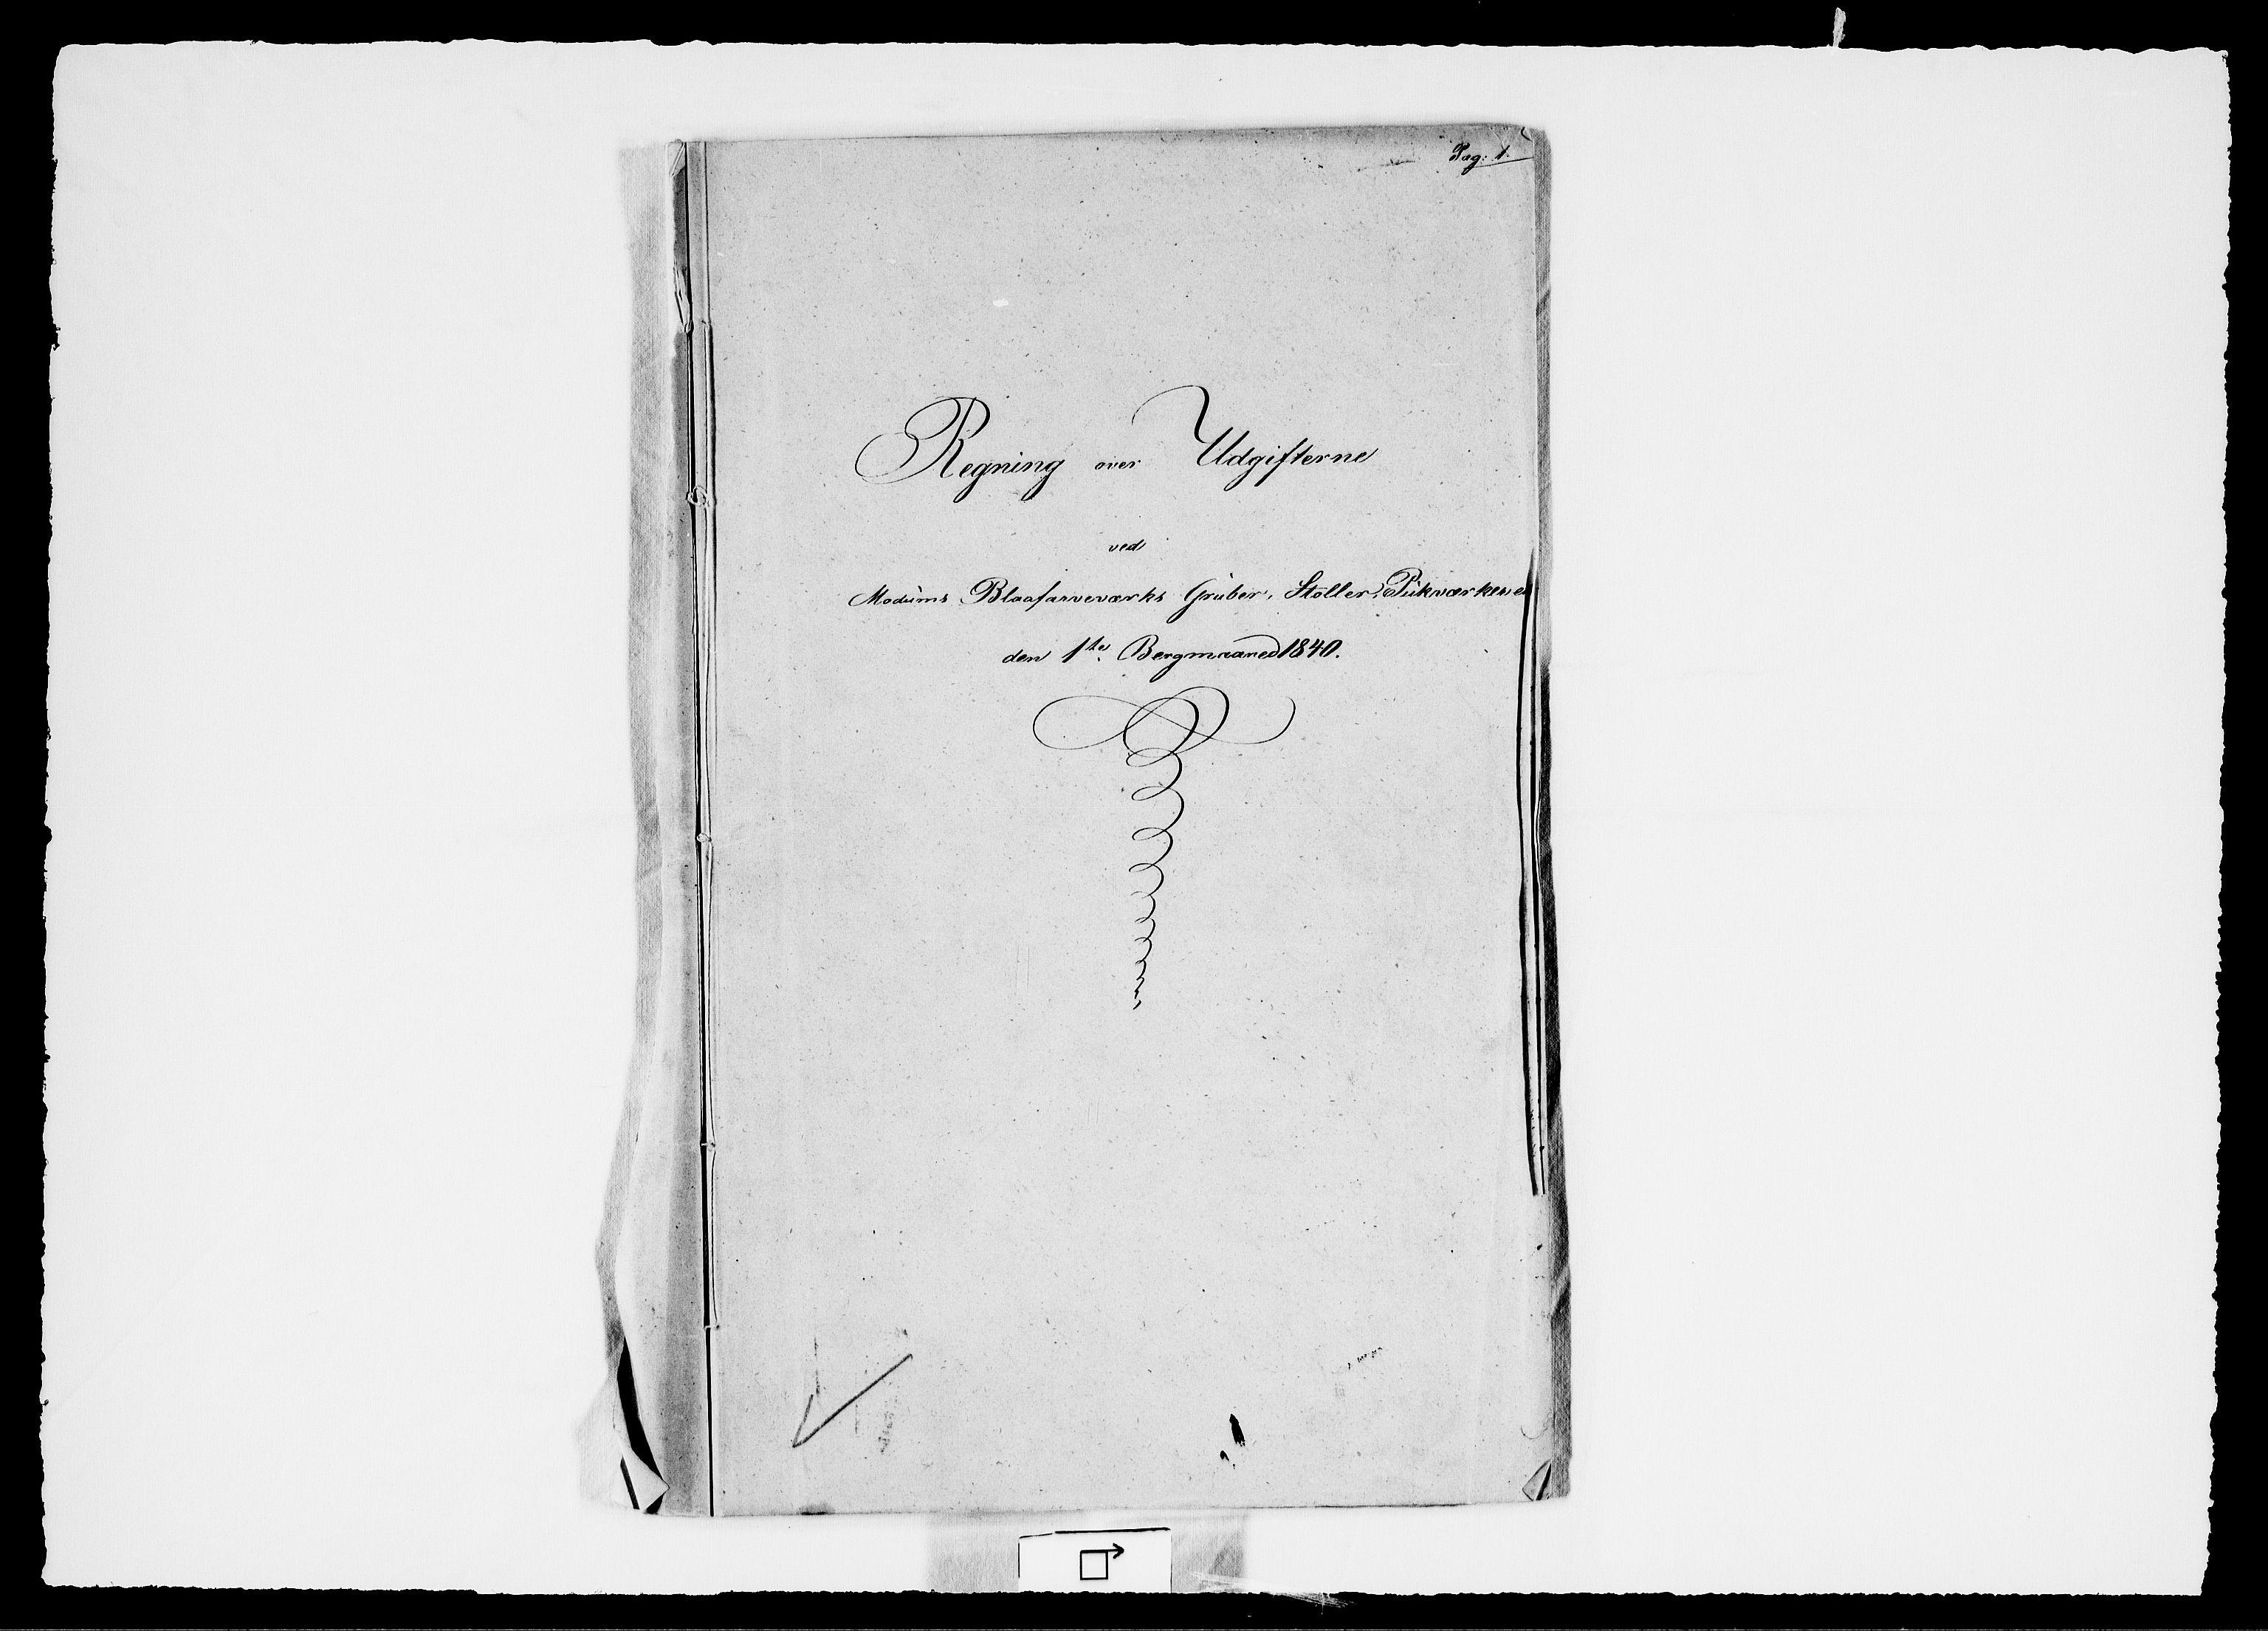 RA, Modums Blaafarveværk, G/Gd/Gdd/L0266, 1840-1841, s. 2